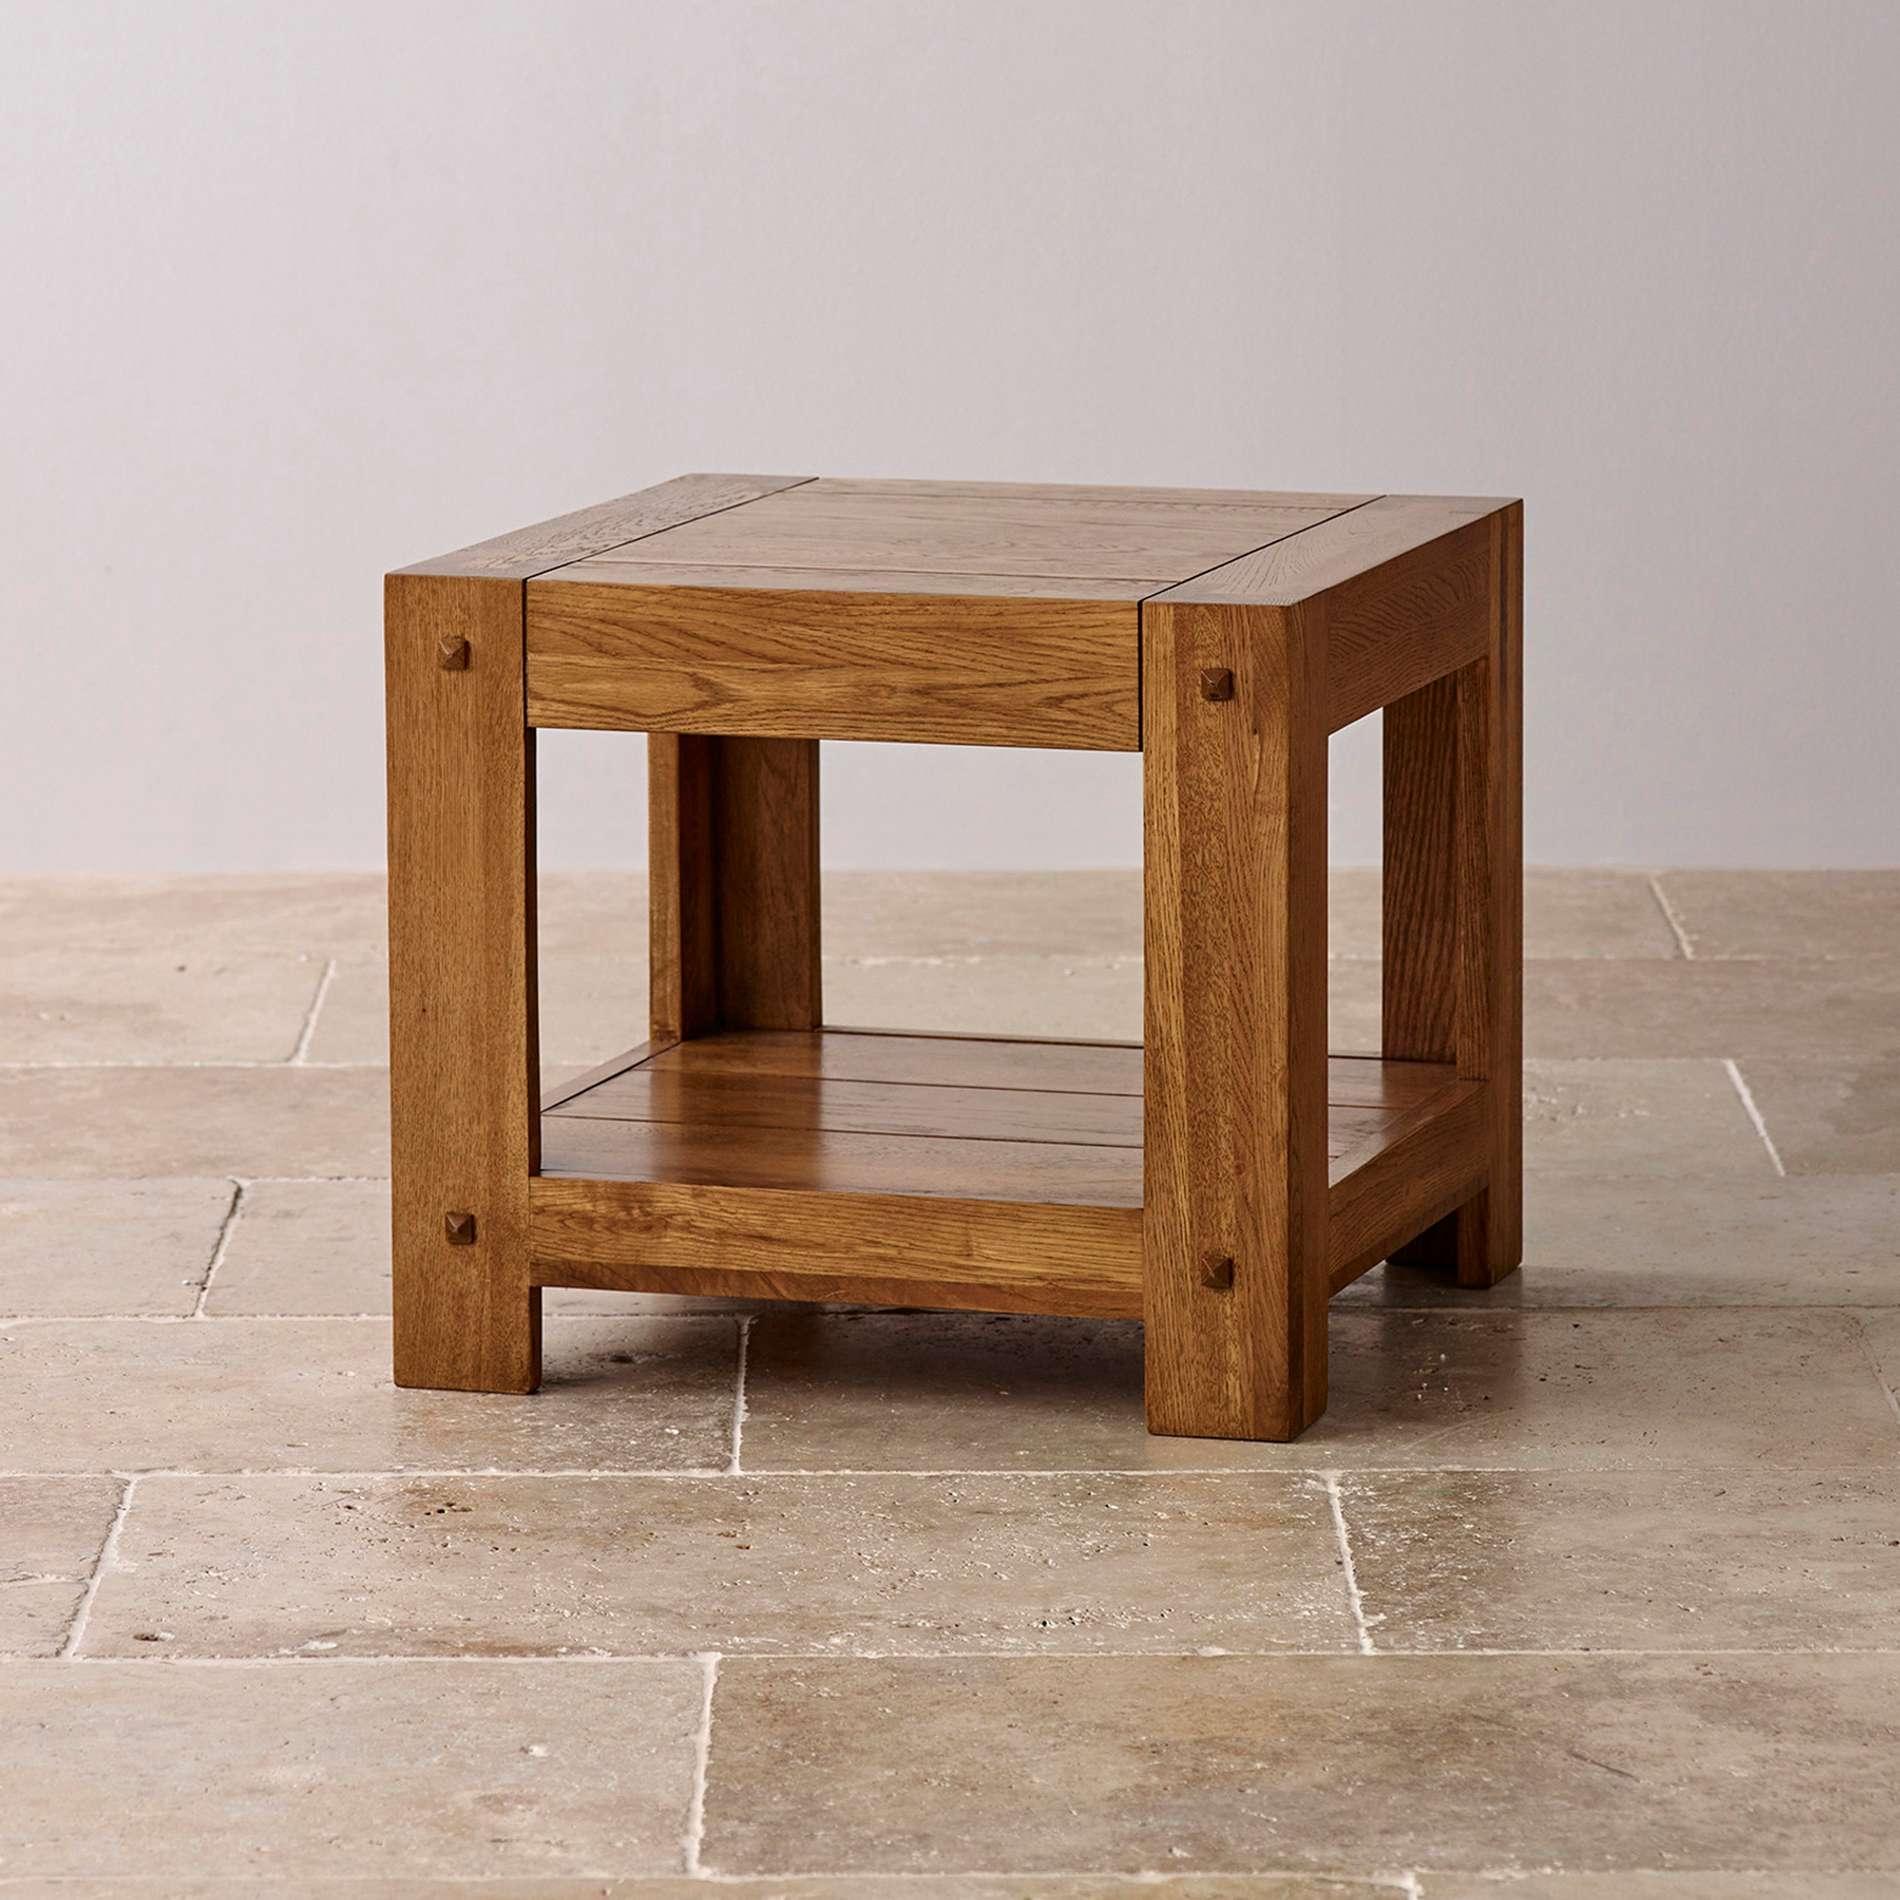 Oak Furniture Land Regarding Favorite Rustic Oak Coffee Tables (View 9 of 20)